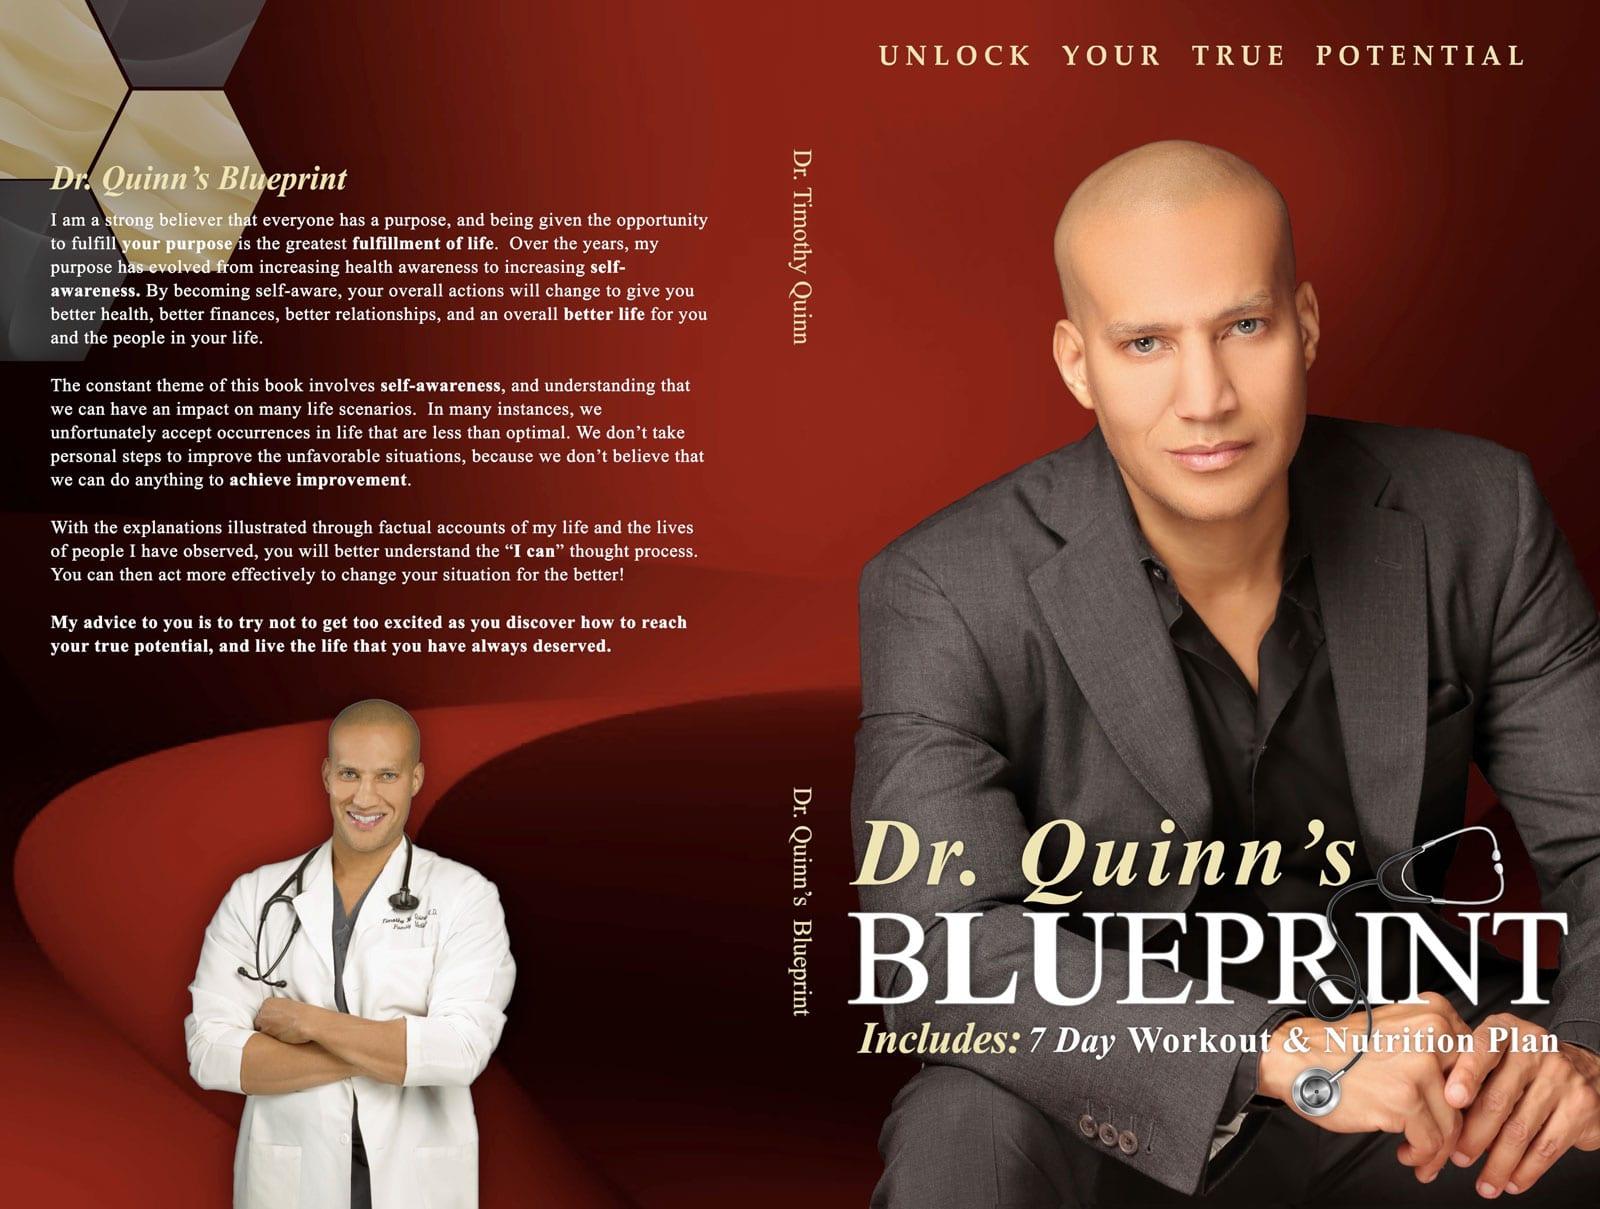 Dr. Quinn's Blueprint